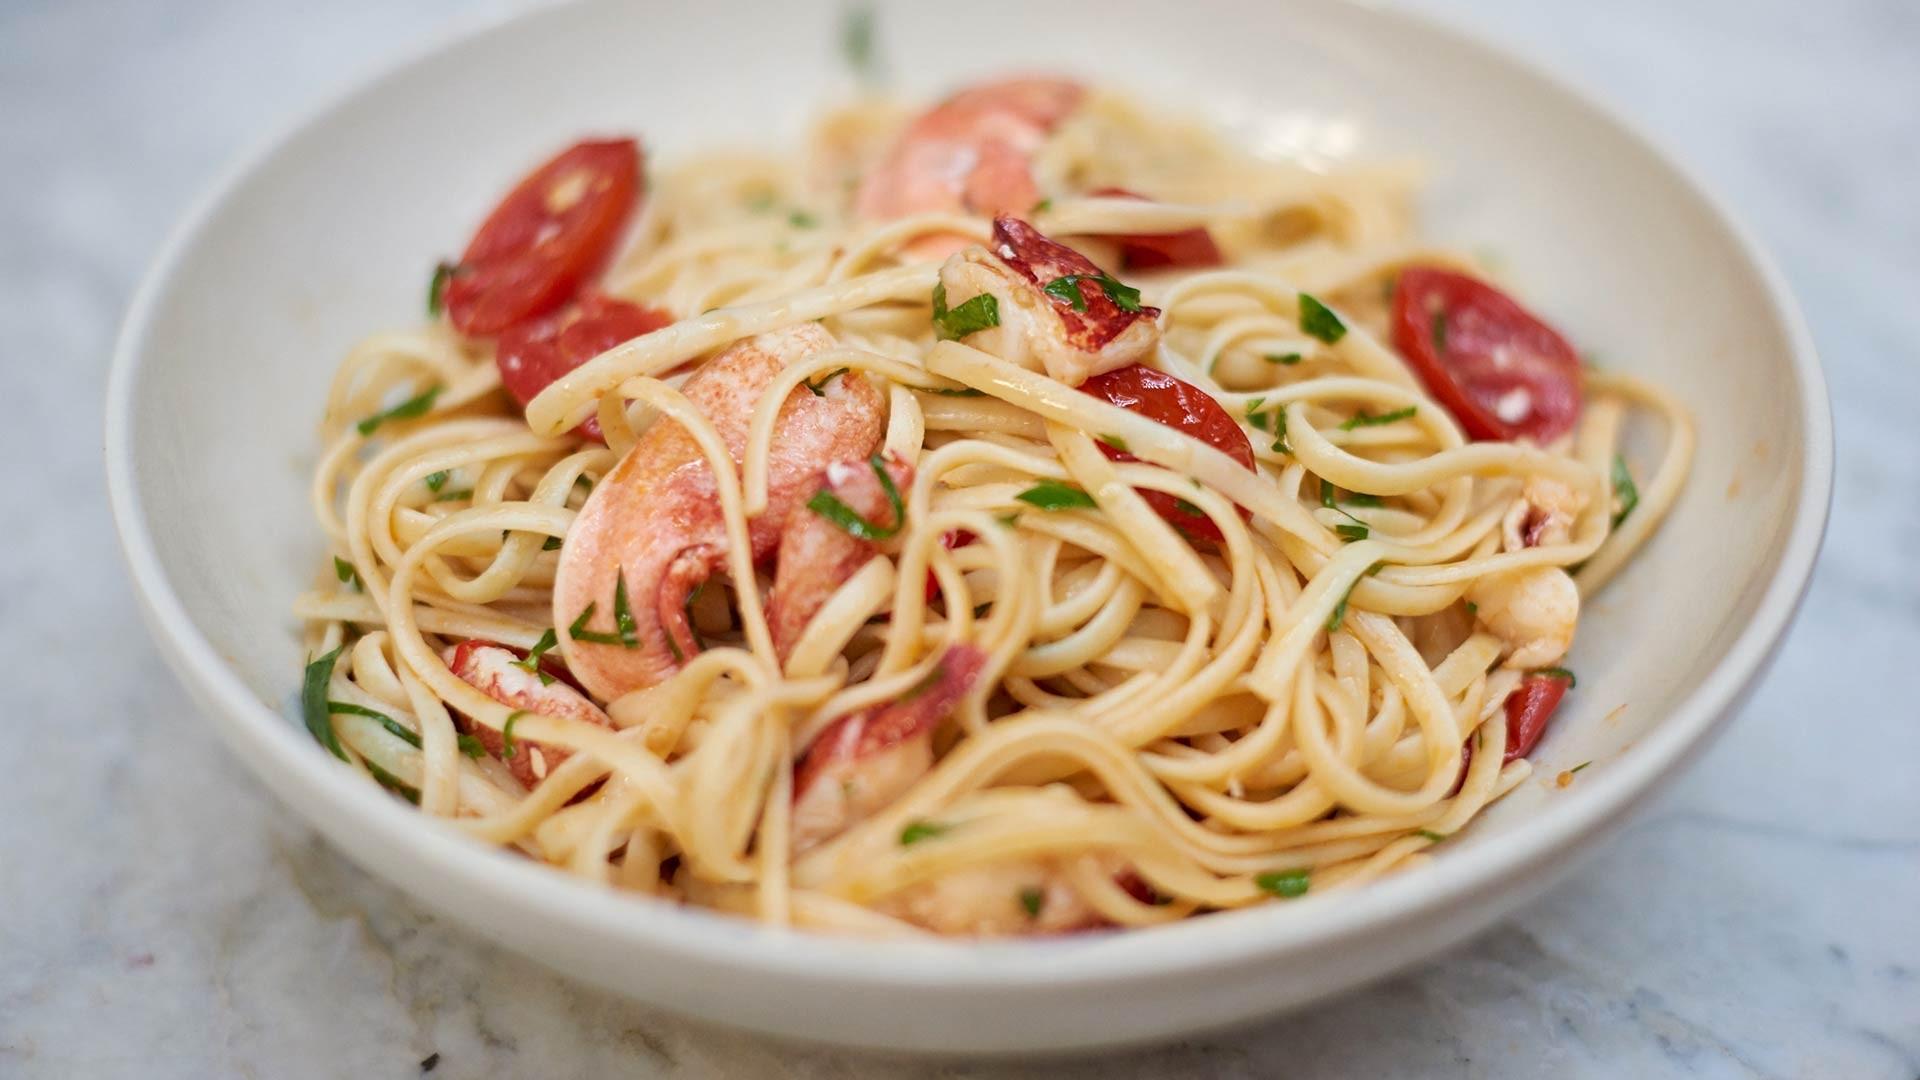 Make Angela Hartnett's lobster spaghetti